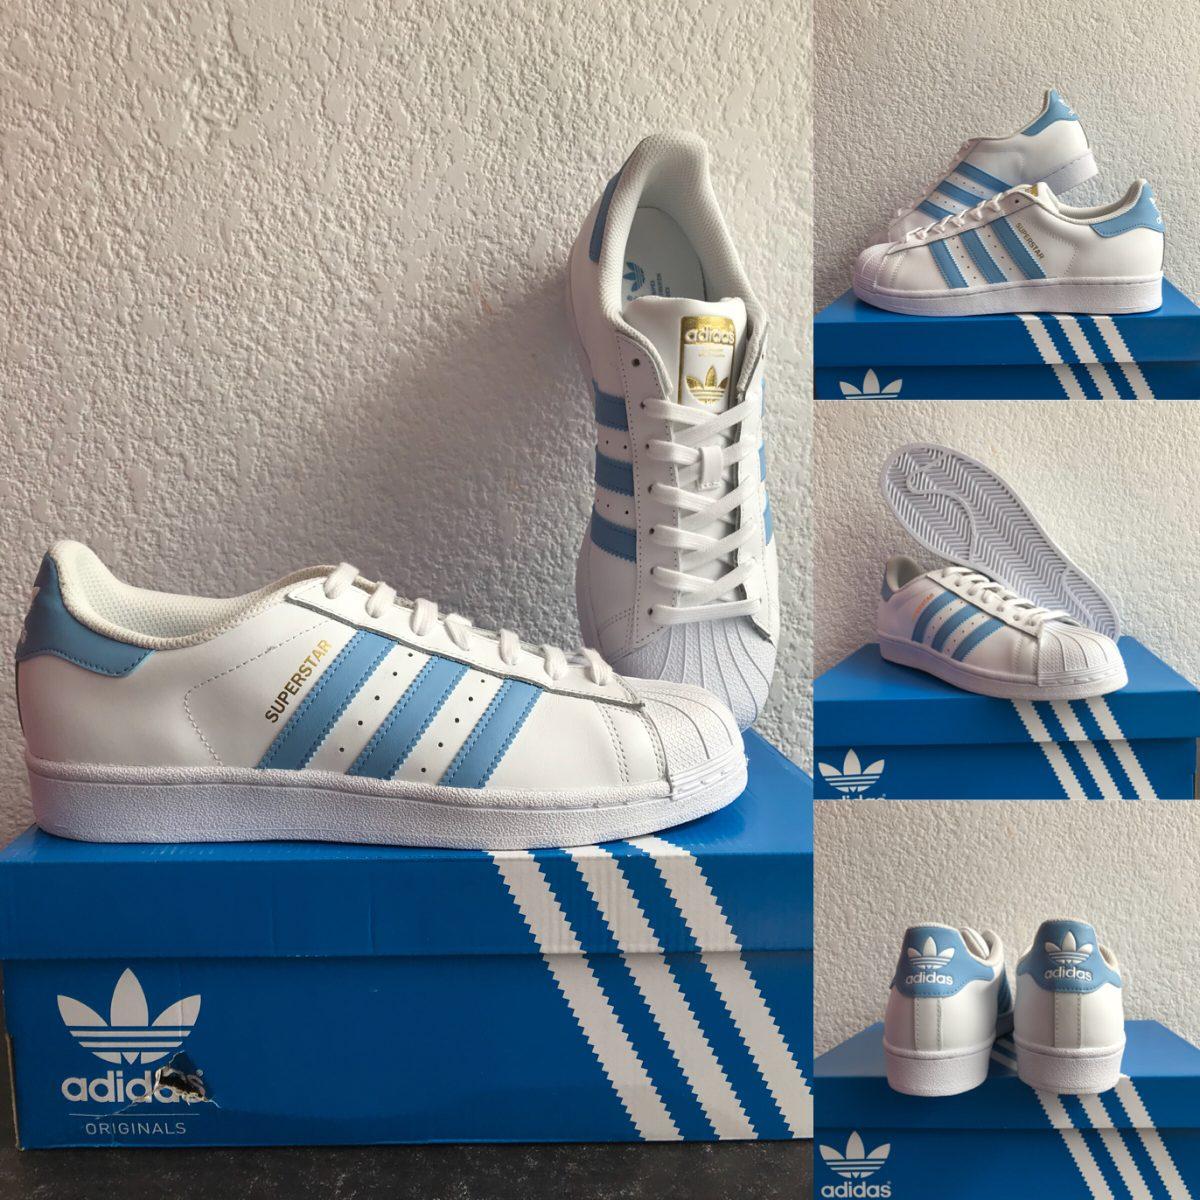 d41b88c0b61 adidas superstar blanco c  líneas azul cielo. talla 6.5. Cargando zoom.